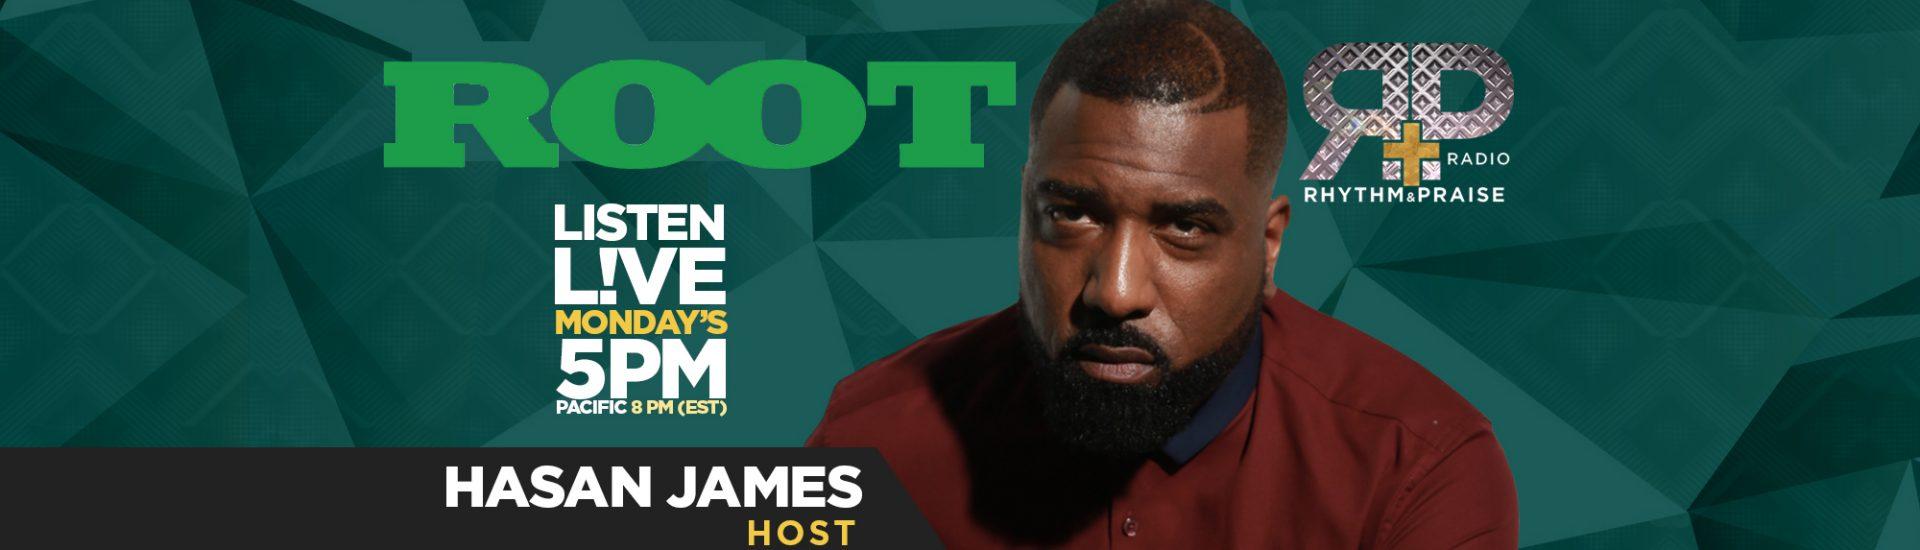 Hasan James - The Root Box